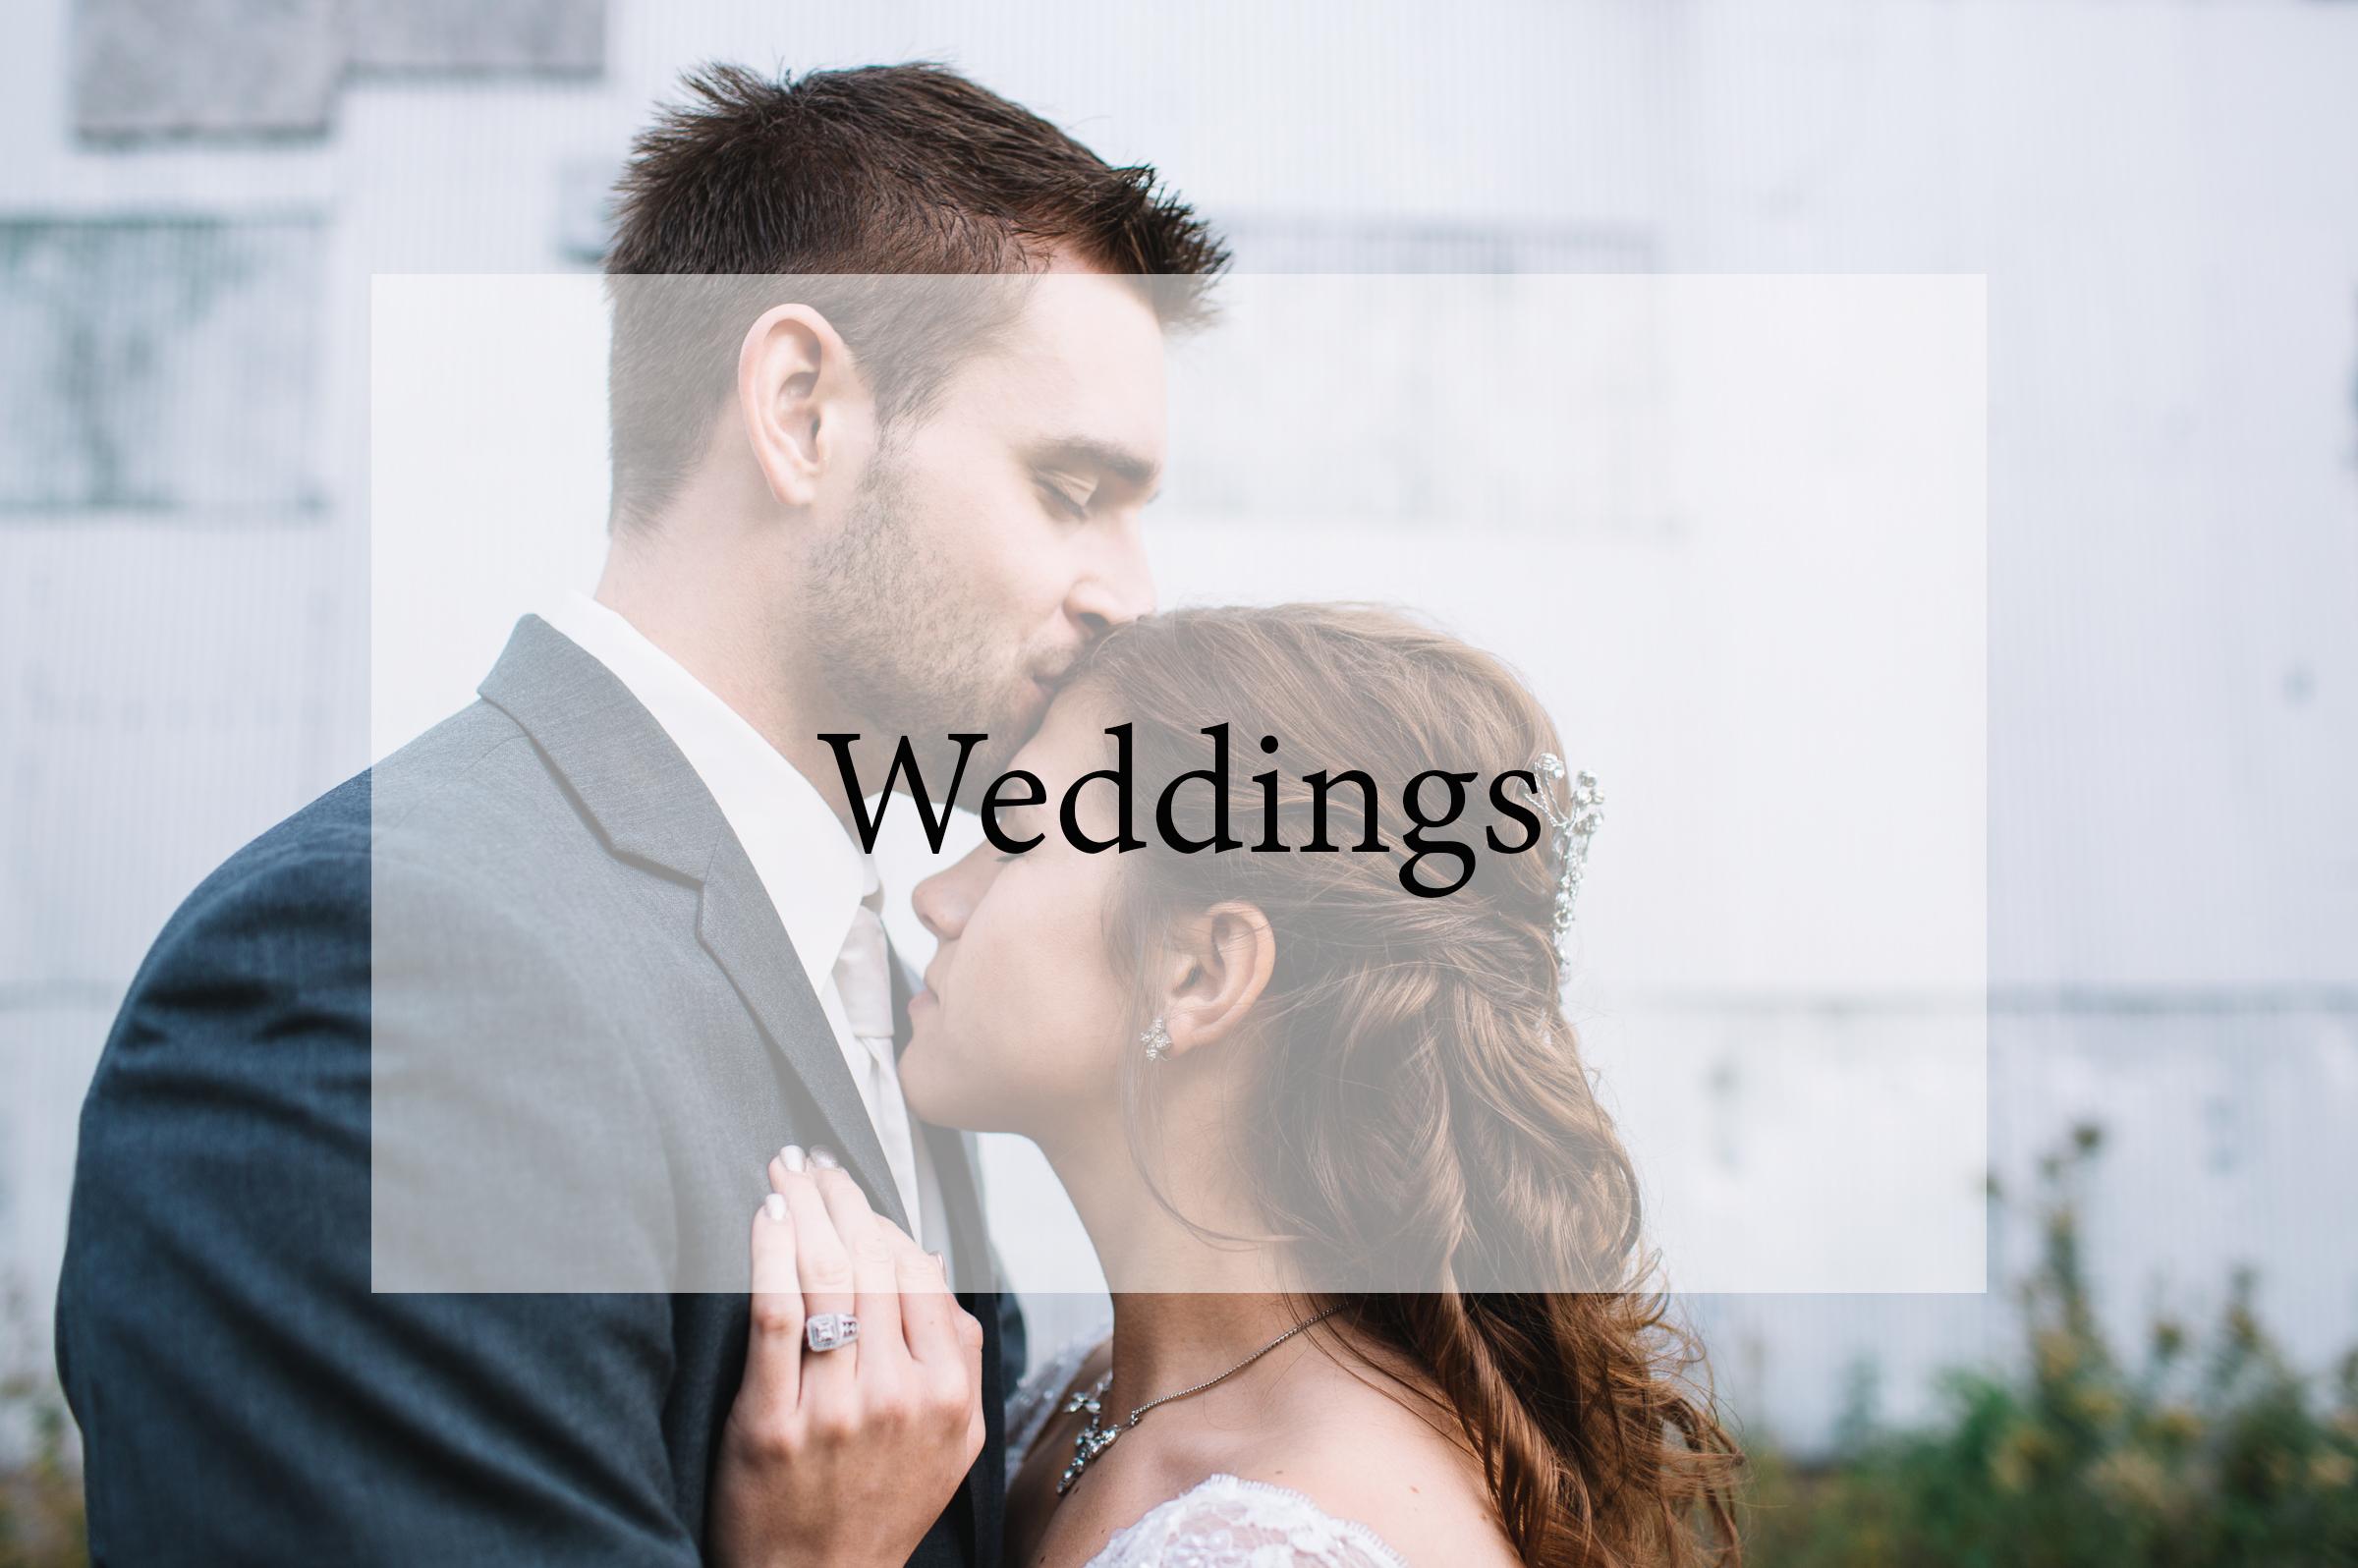 weddinglink.jpg